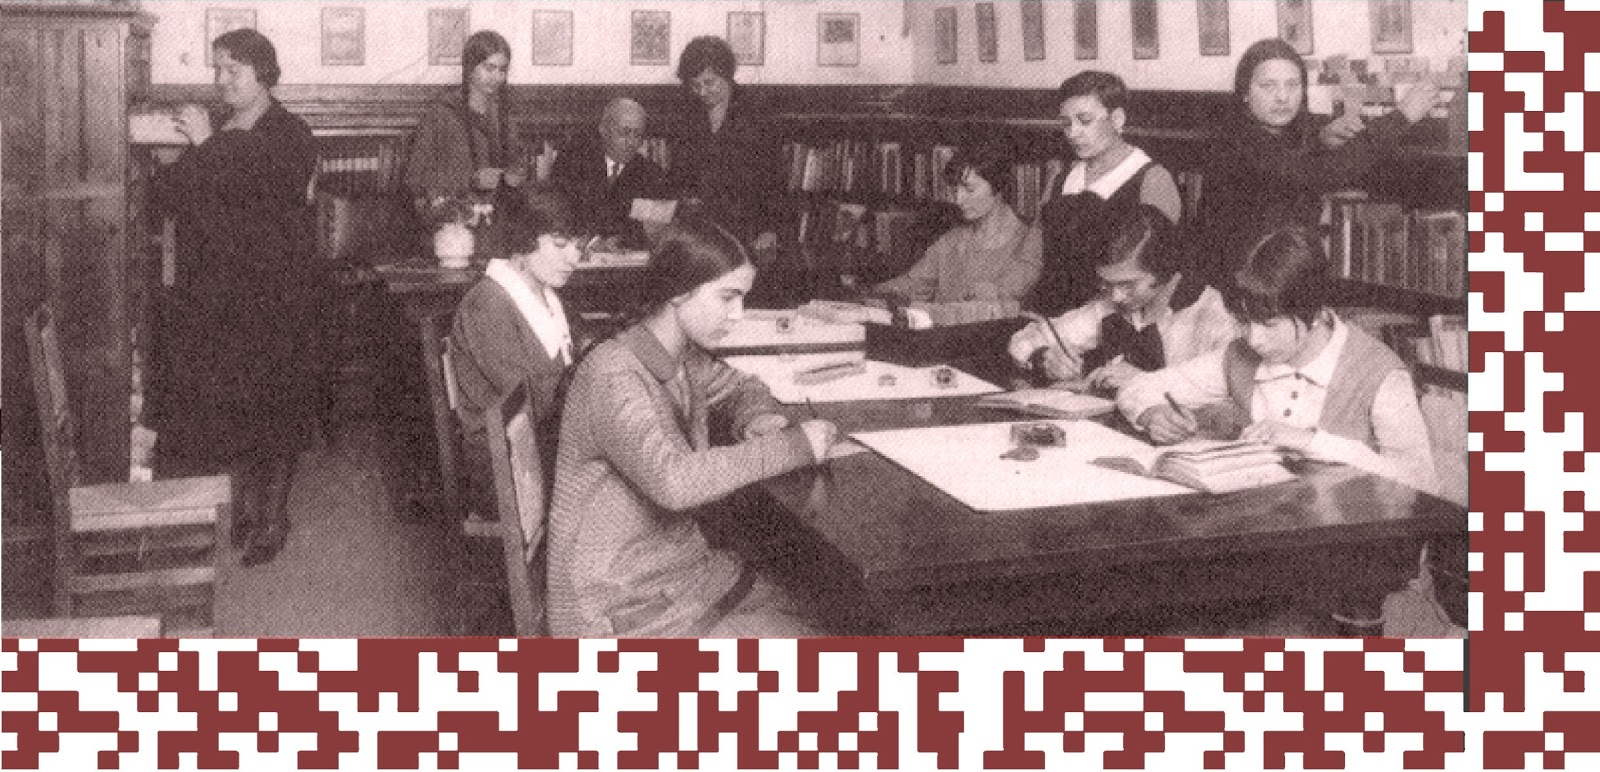 http://www.ub.edu/biblio/noticies/exposicio-cent-anys-d-estudis-i-de-professio-bibliotecaria.-1915-2015.html